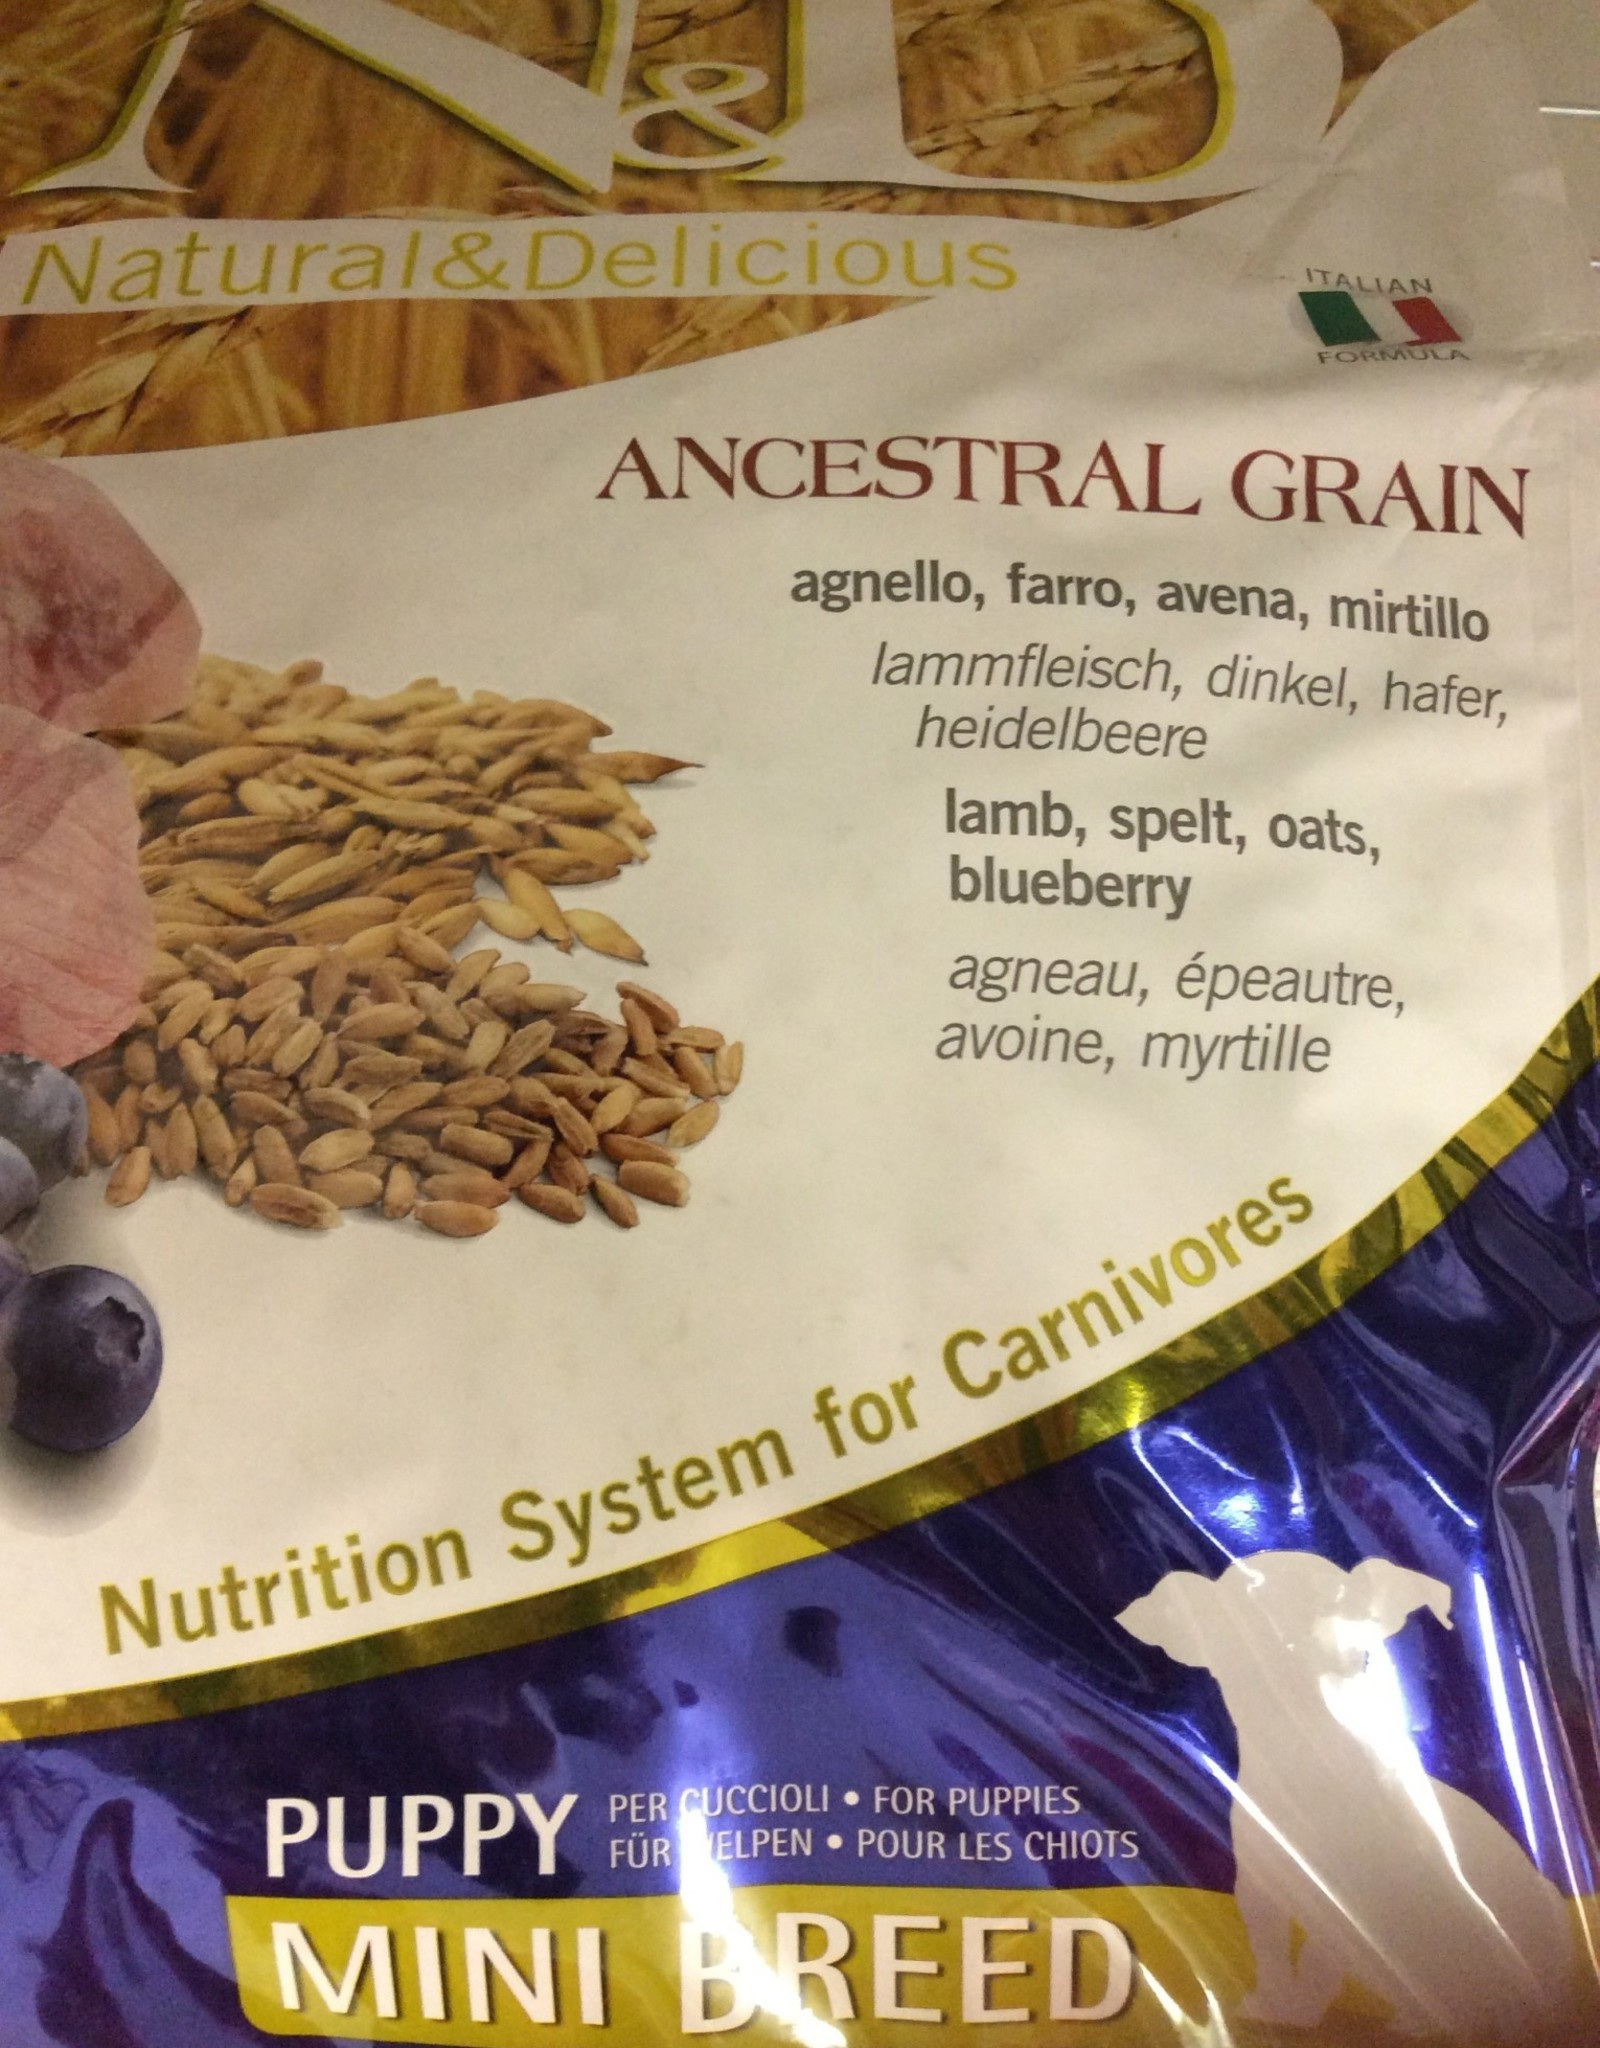 Farmina Dog Dry Food - Ancestrial Grain 15.4LB Lamb & Blueberry Puppy Mini